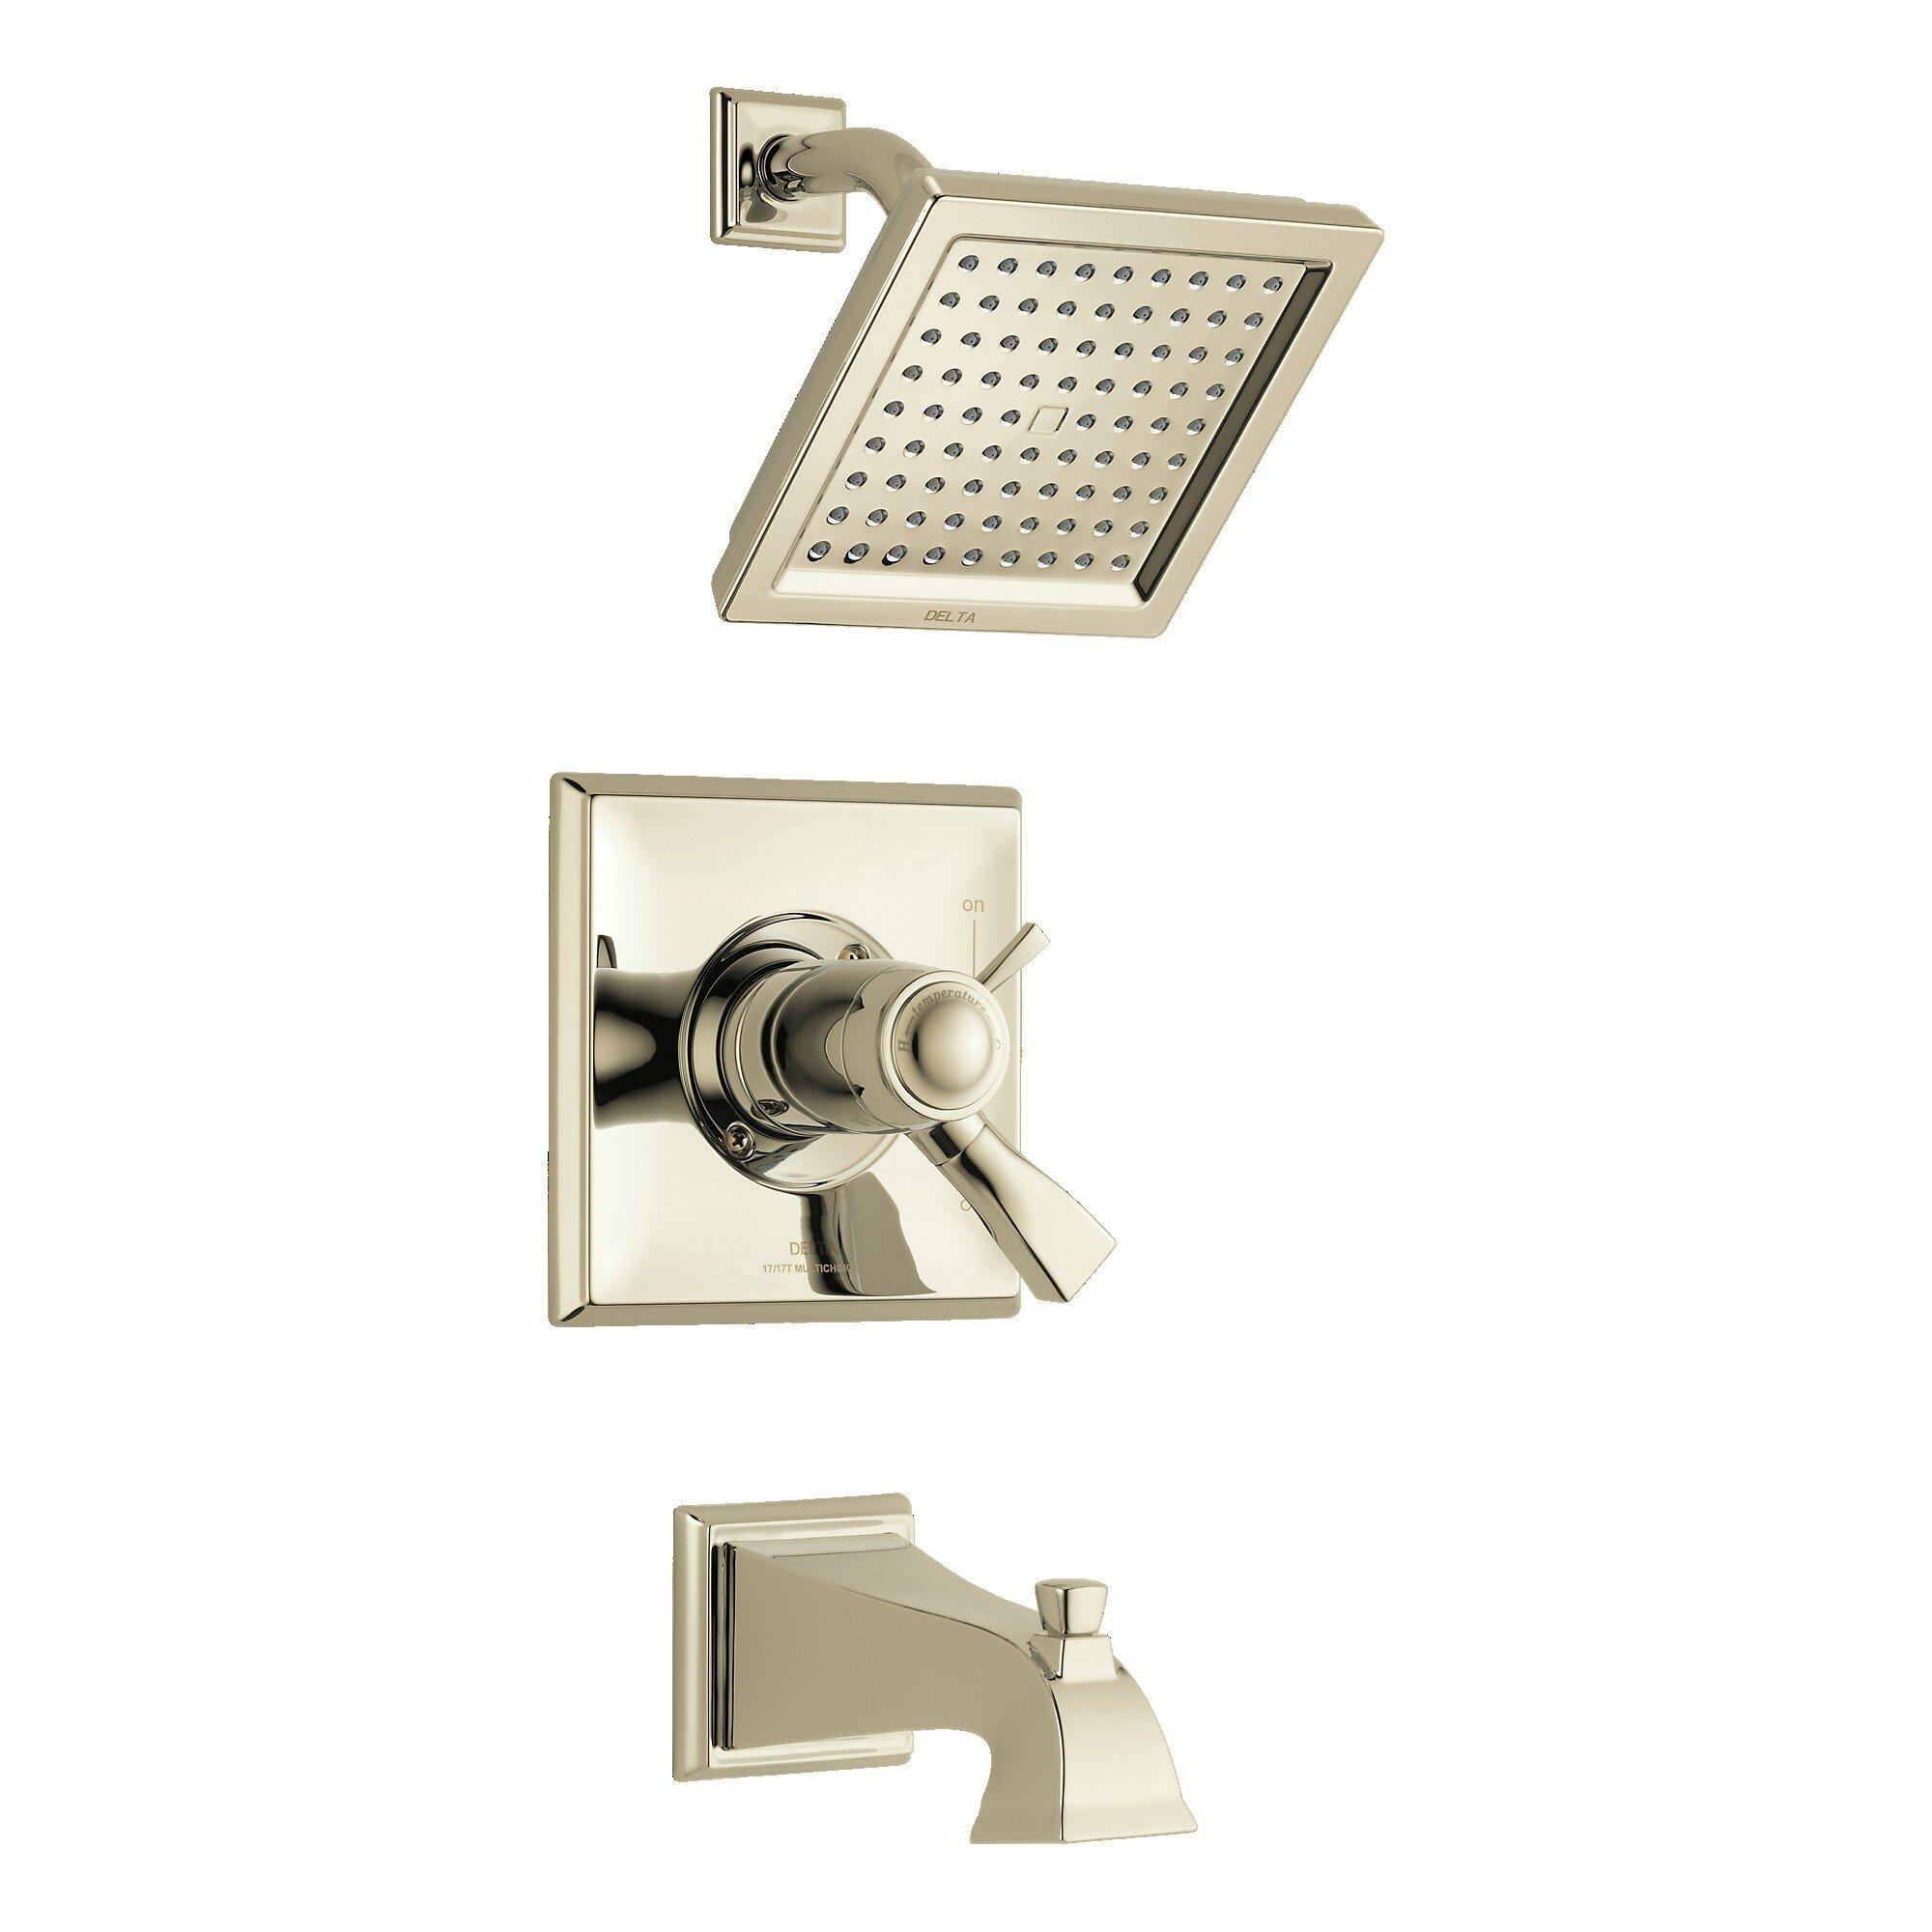 T17t451 Pn Cz Delta Dryden Tub And Shower Faucet With Tempassure